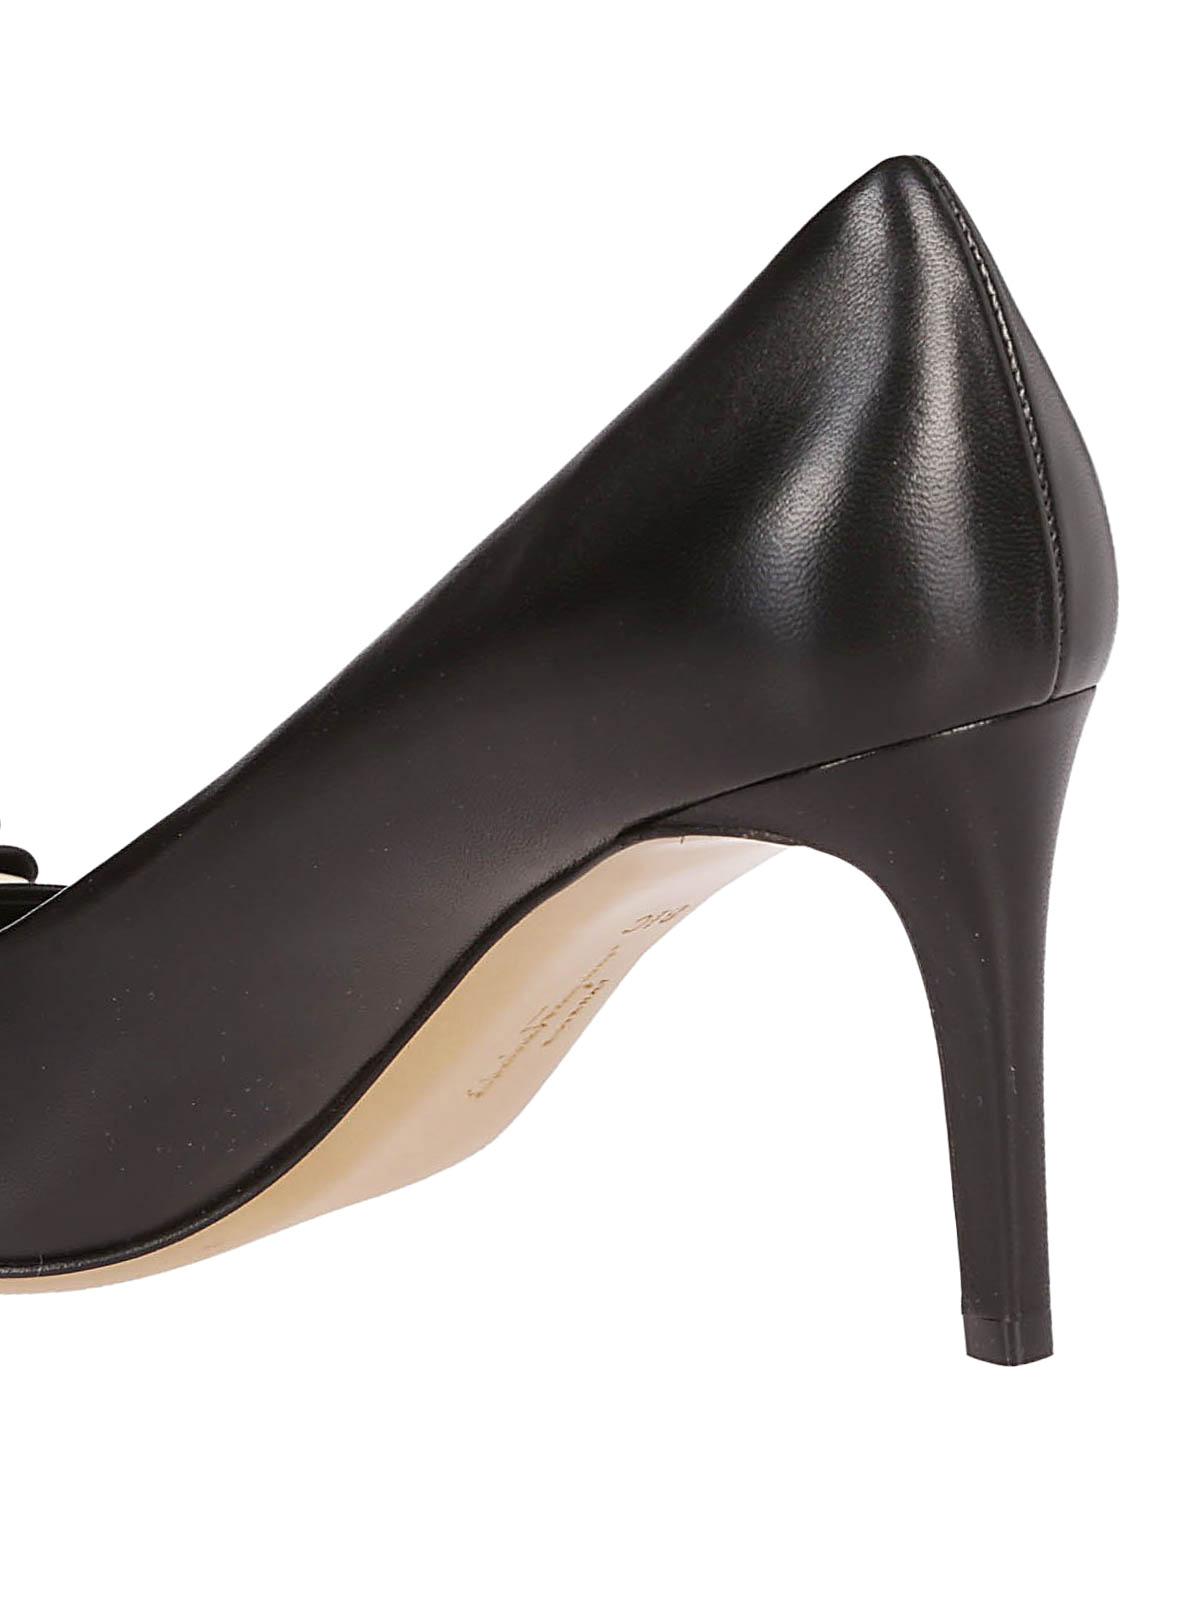 6cd96e831c2da iKRIX-salvatore-ferragamo-court-shoes-zeri-black-leather-pumps-00000148679f00s003.jpg